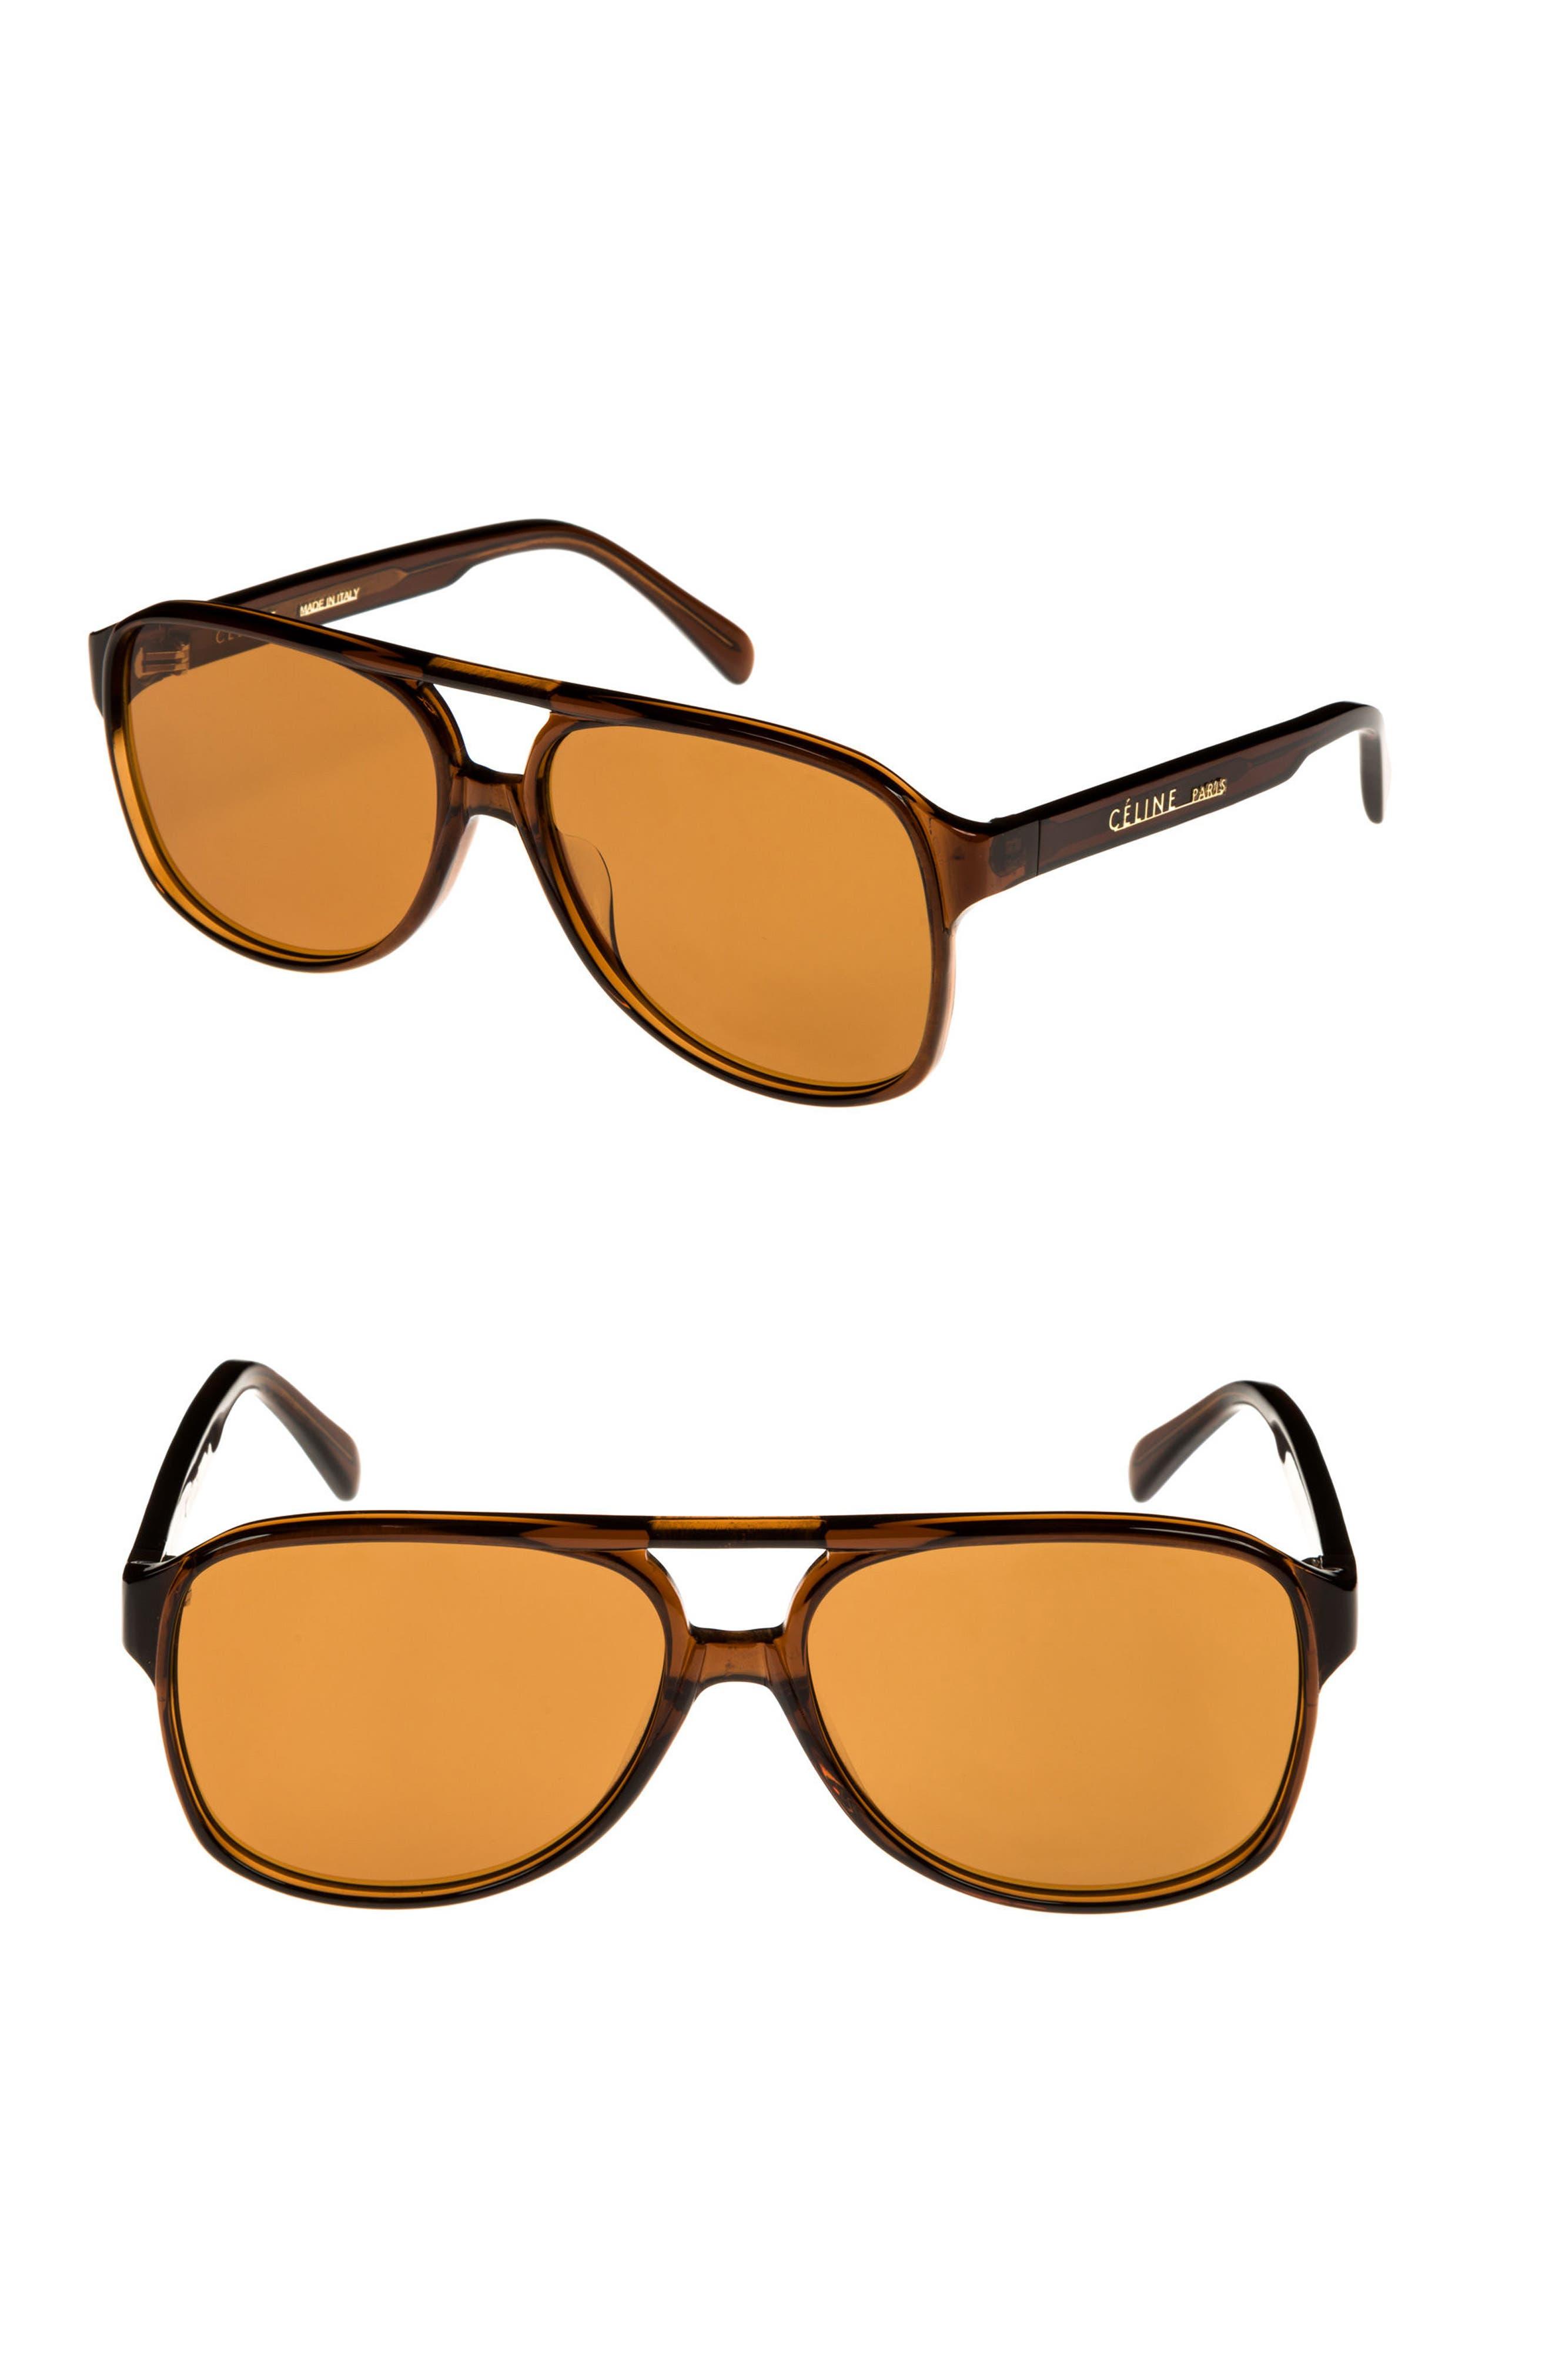 62mm Oversize Aviator Sunglasses,                         Main,                         color, BROWN VINTAGE